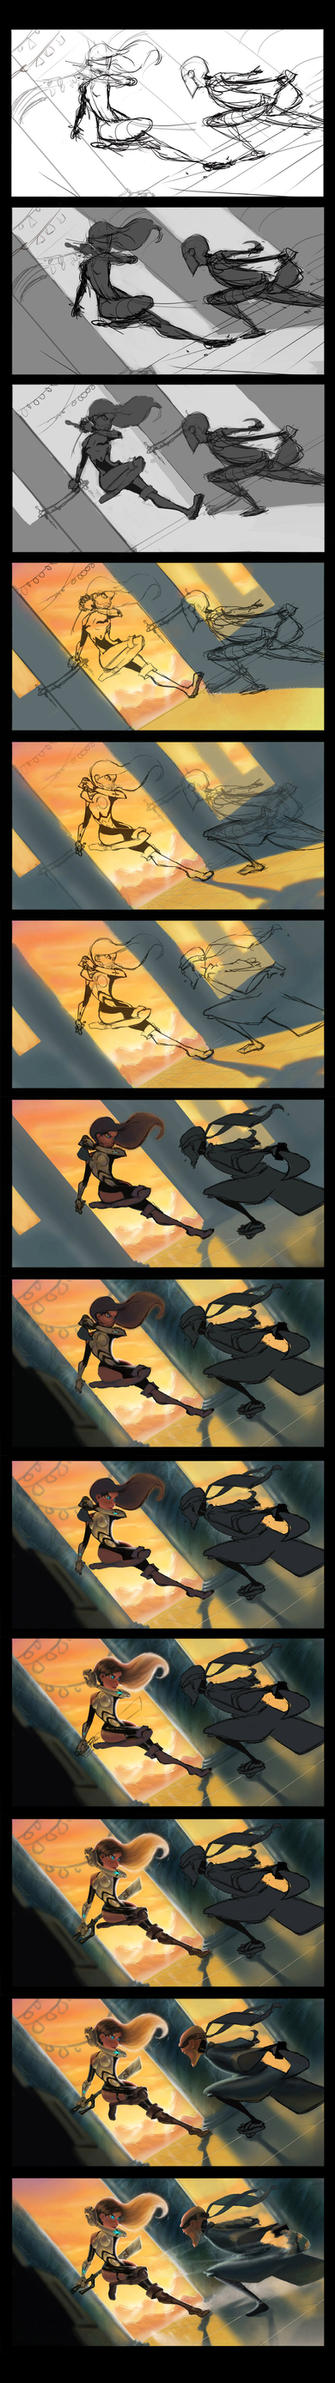 They fight step by step by DanielAraya